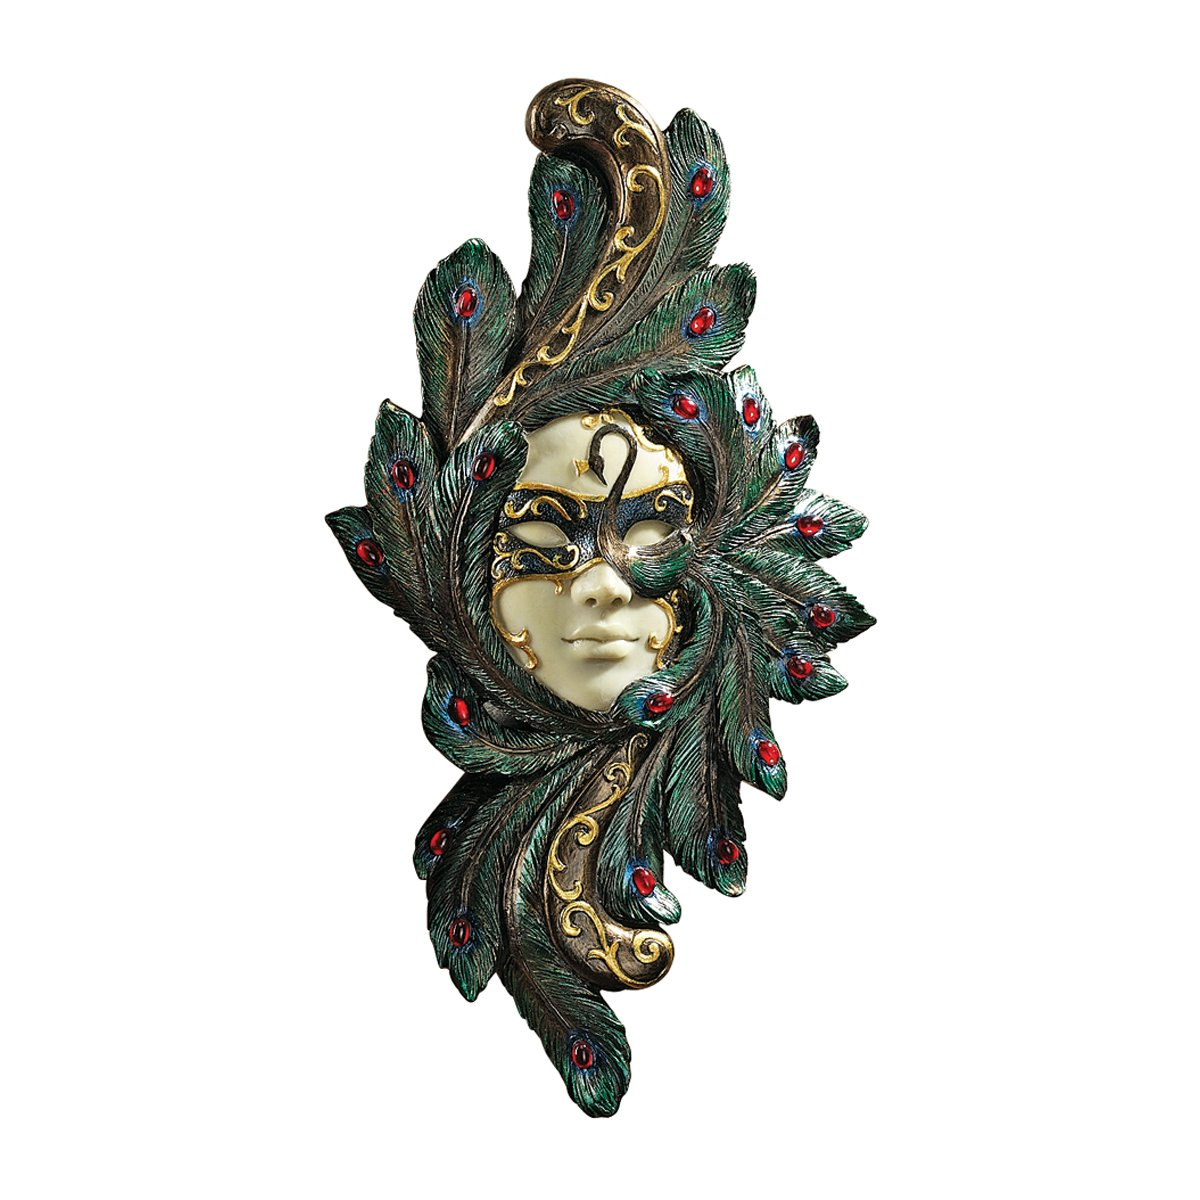 Design Toscano PD2278 Scultura Murale Maschera per Mascherata di Carnevale, Contessa Alessandra